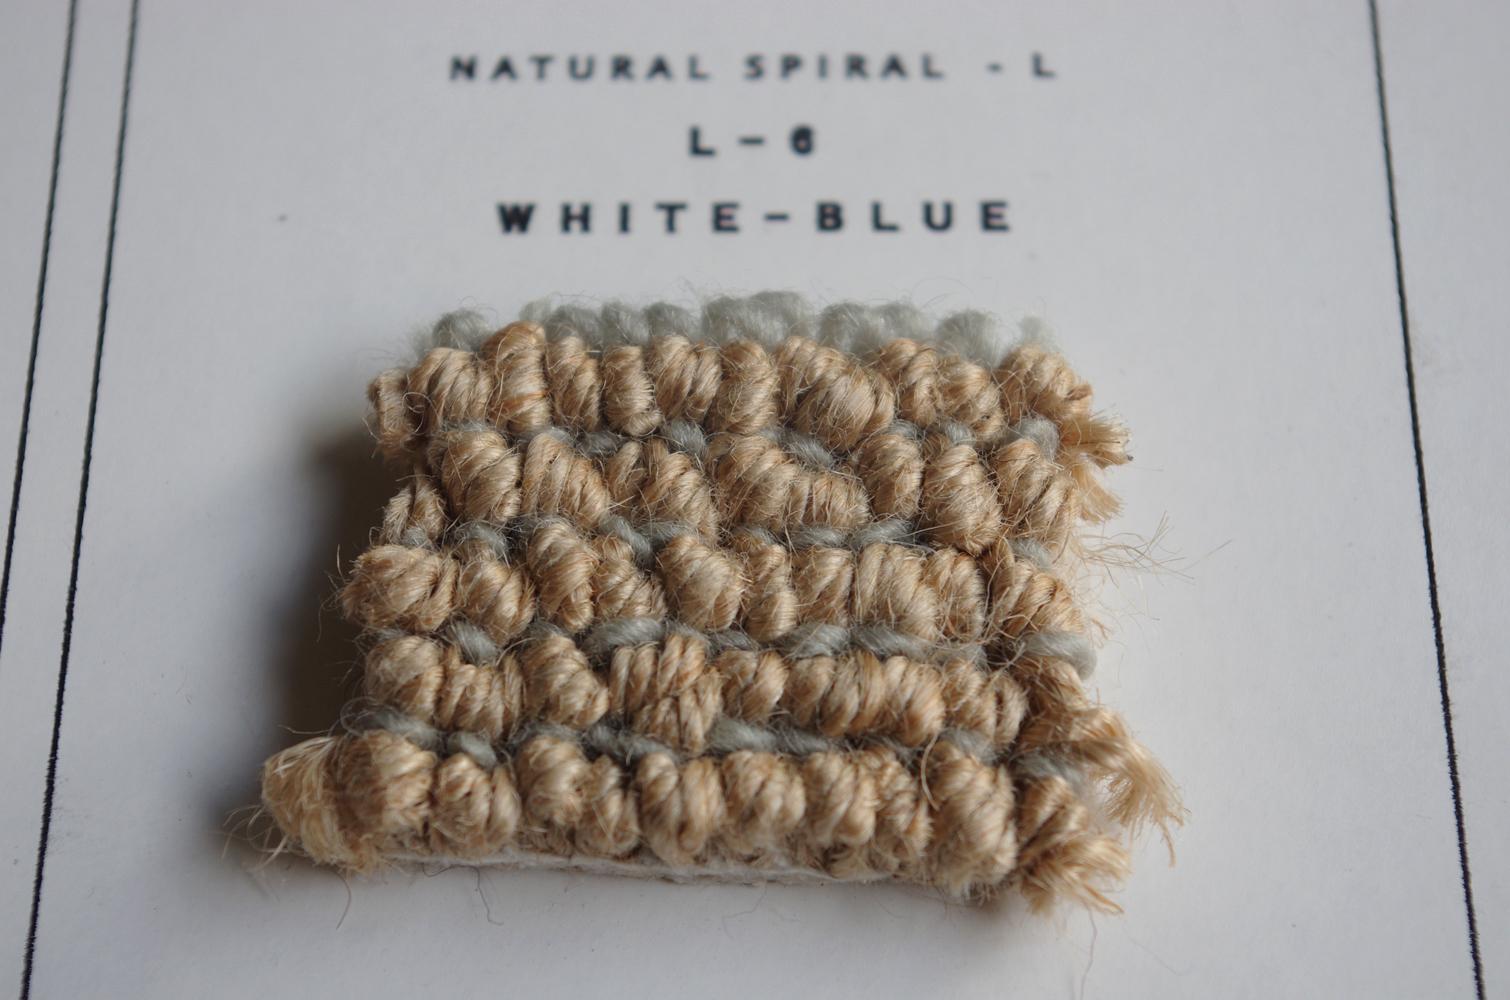 l-6-white-bluel